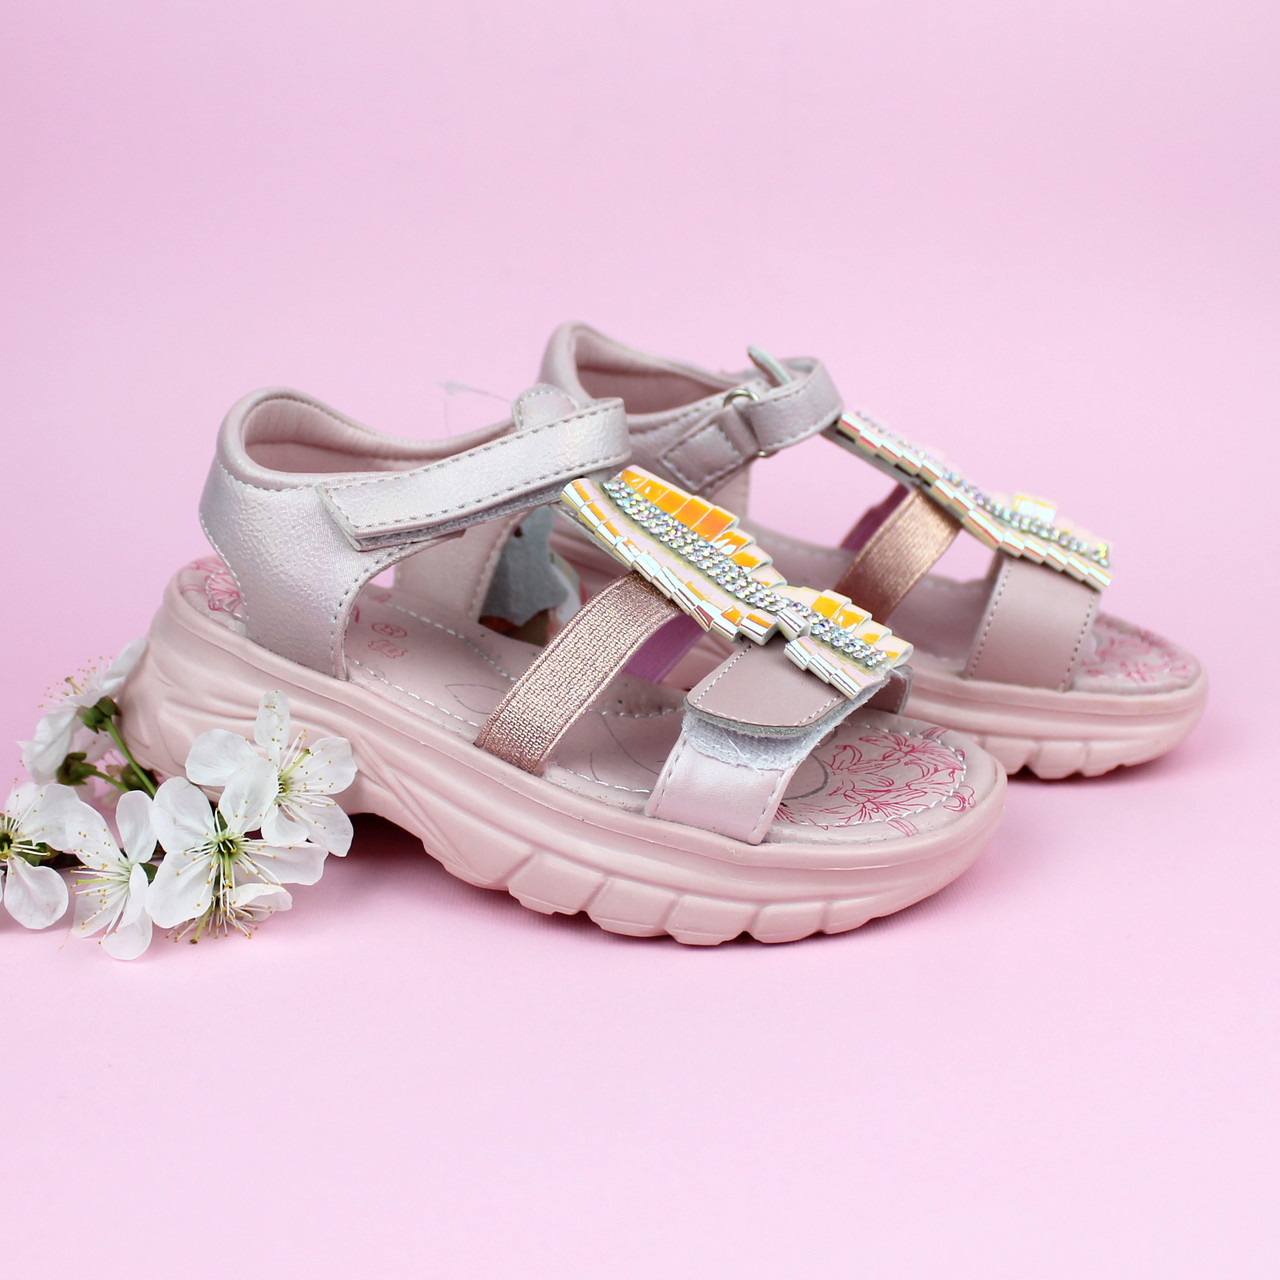 Розовые босоножки для девочки подошва танкетка тм Tom.m р. 27,28,29,30,31,32